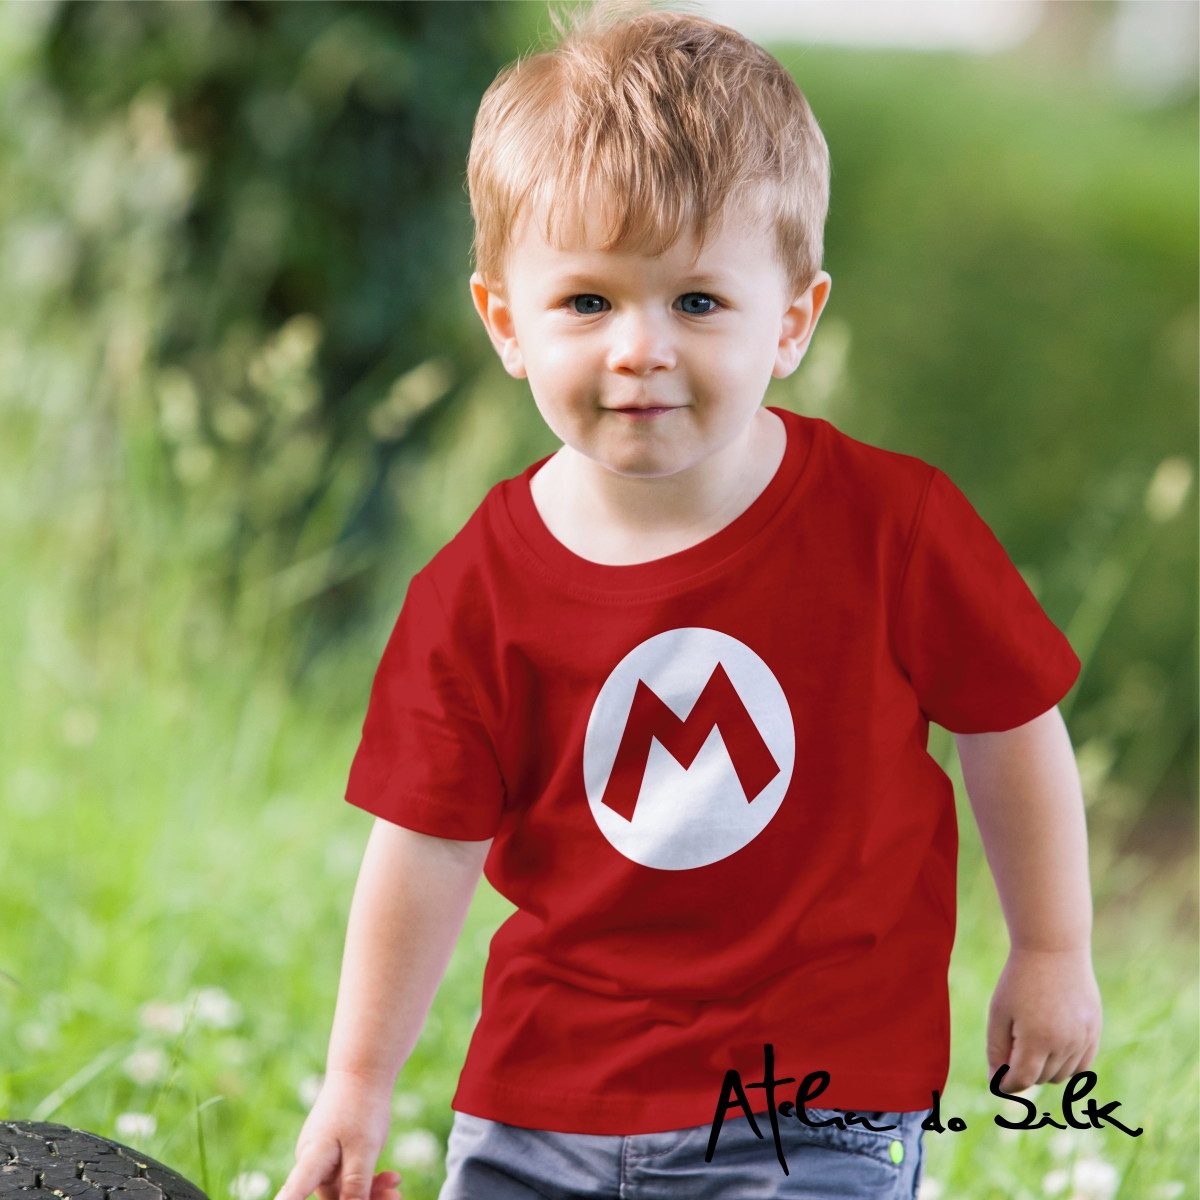 3cad86809 Camiseta Infantil Super Mario Bros no Elo7